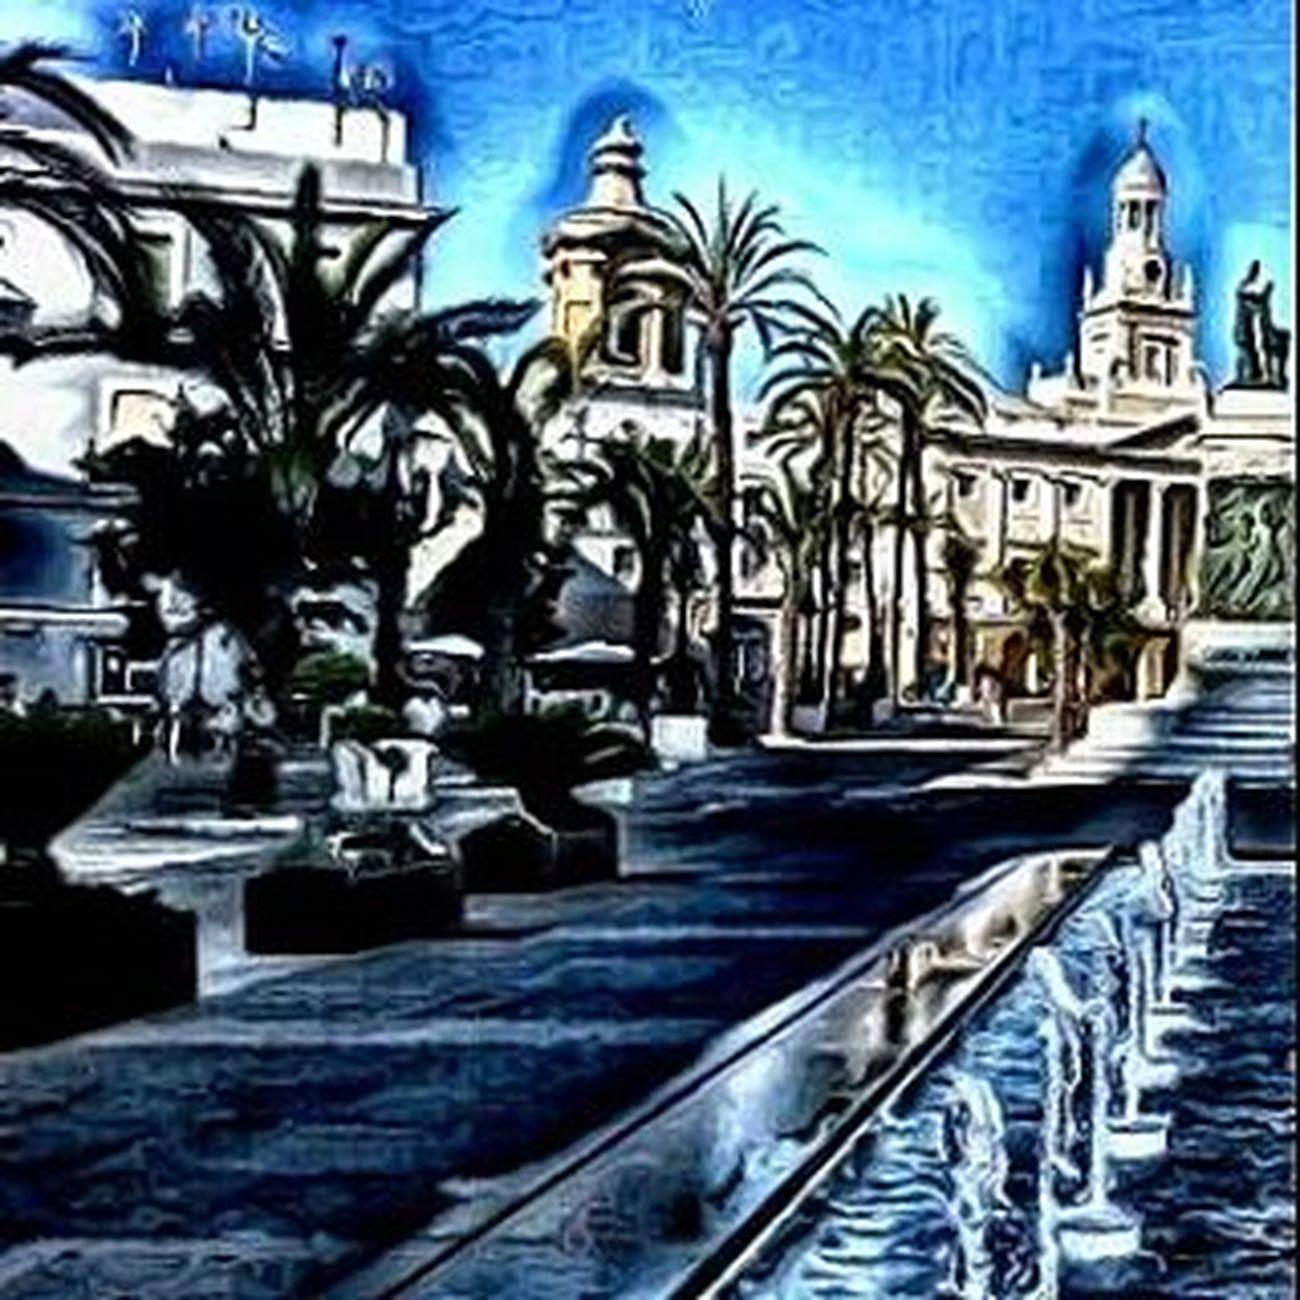 Ayuntamiento de Cádiz Andalucia_monumental IG_andalucia Igerscadiz Coolworld_hdr Asiesandalucia Andaluciaviva Estaes_cadiz Estaes_espania Ok_spain Loves_cadiz Roadwarrior_hdr Ok_hdr Love_hdr_colour Hdr_lovers Hdr_captures Great_captures_HDR Todoclick Hdr_pics Bns_mod Hdr_europe Instaphotomatix Hdr_spain Hdr_professional Be_one_hdr Insta_world_free ok_streets total_hdr hdr_city_